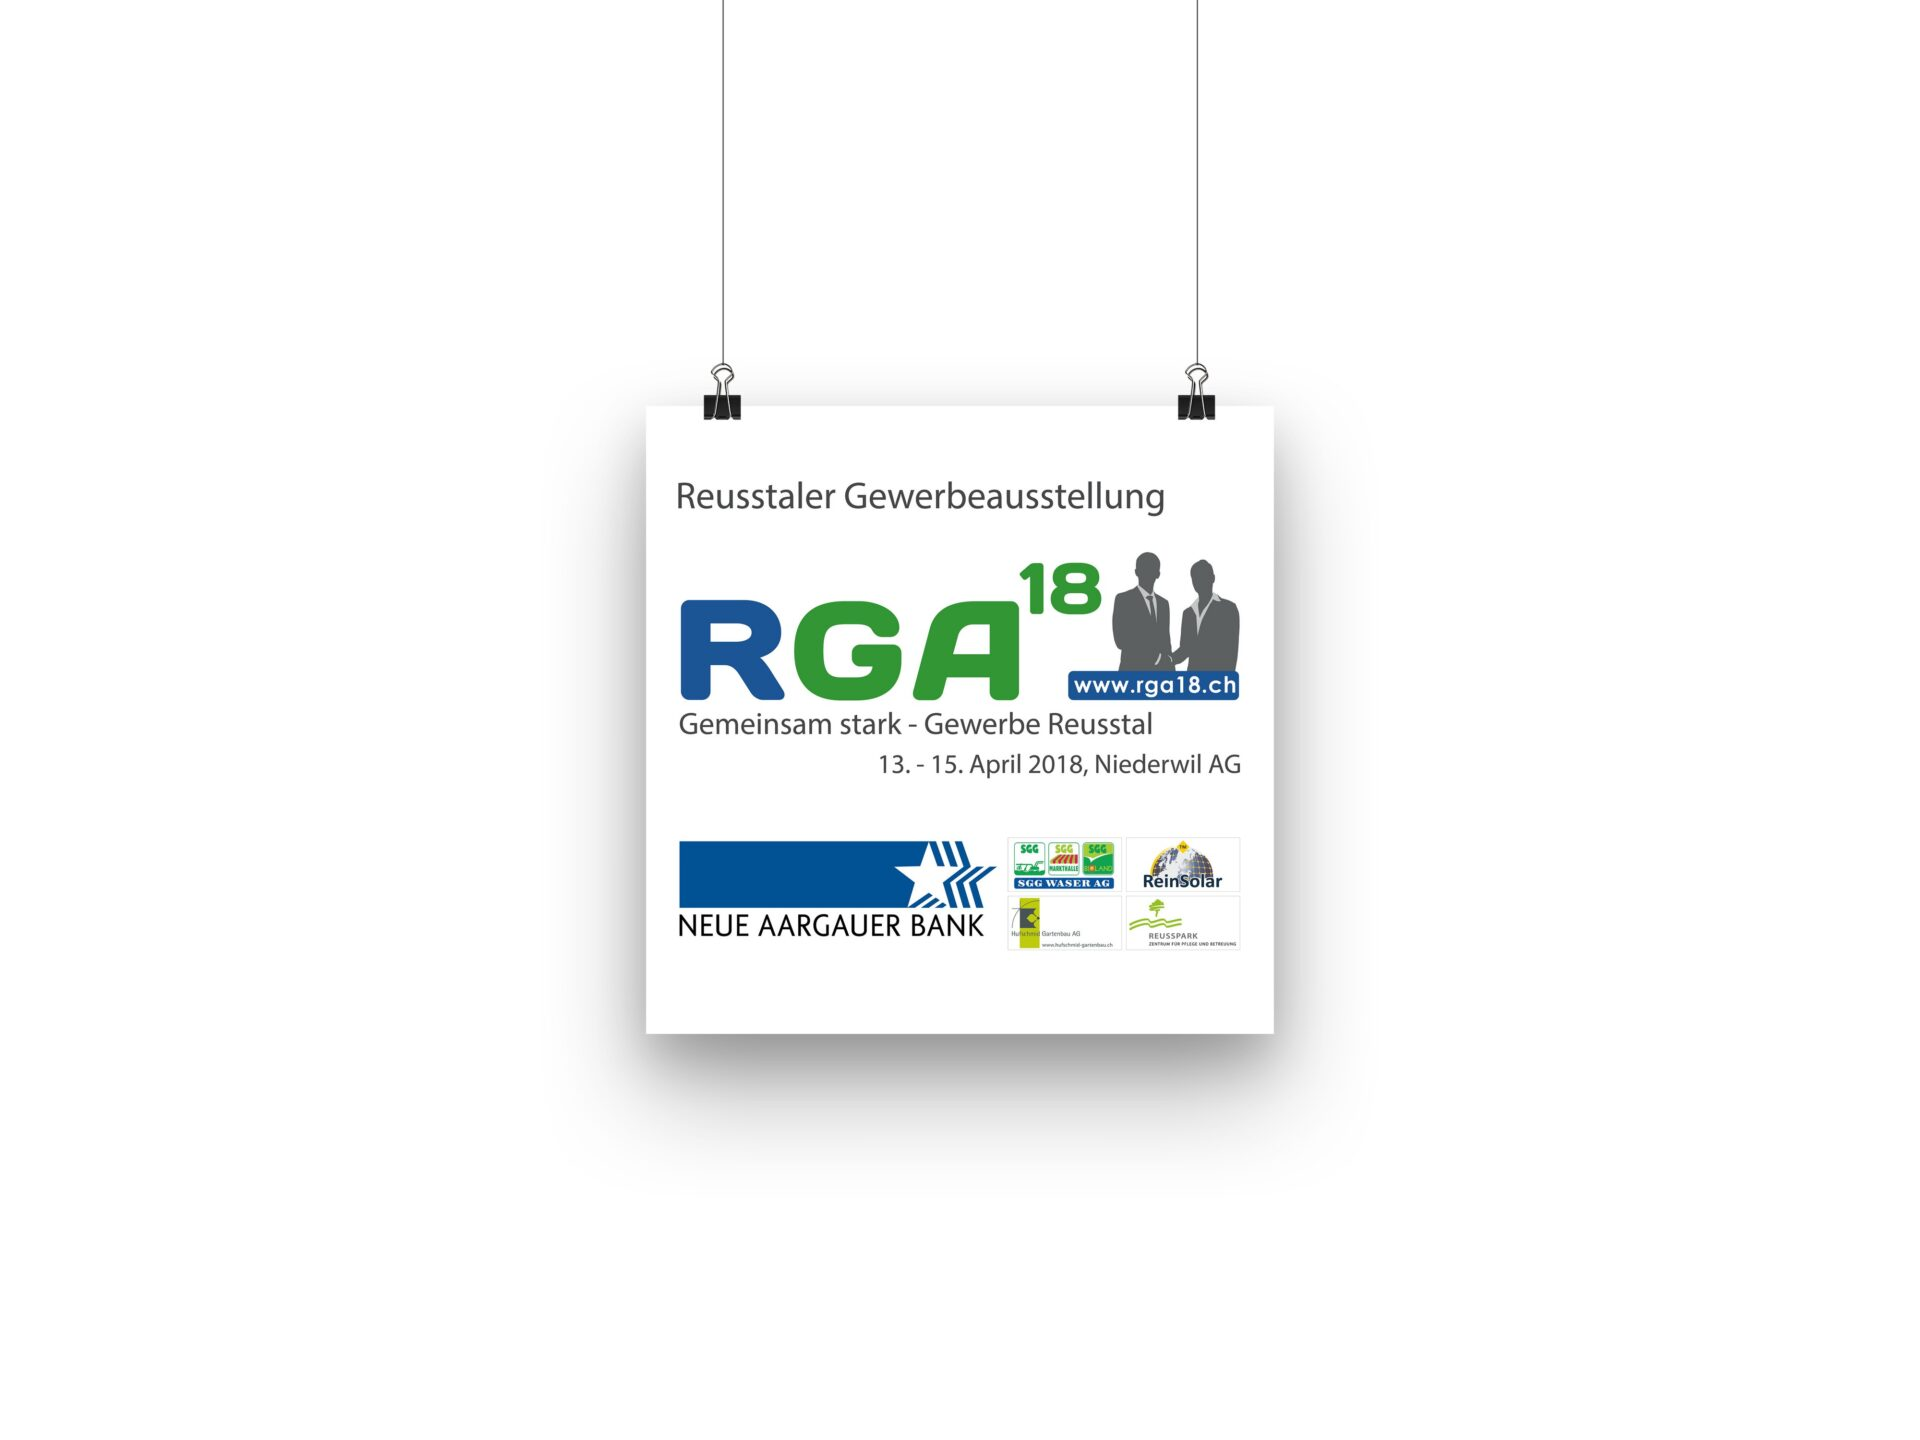 rga18